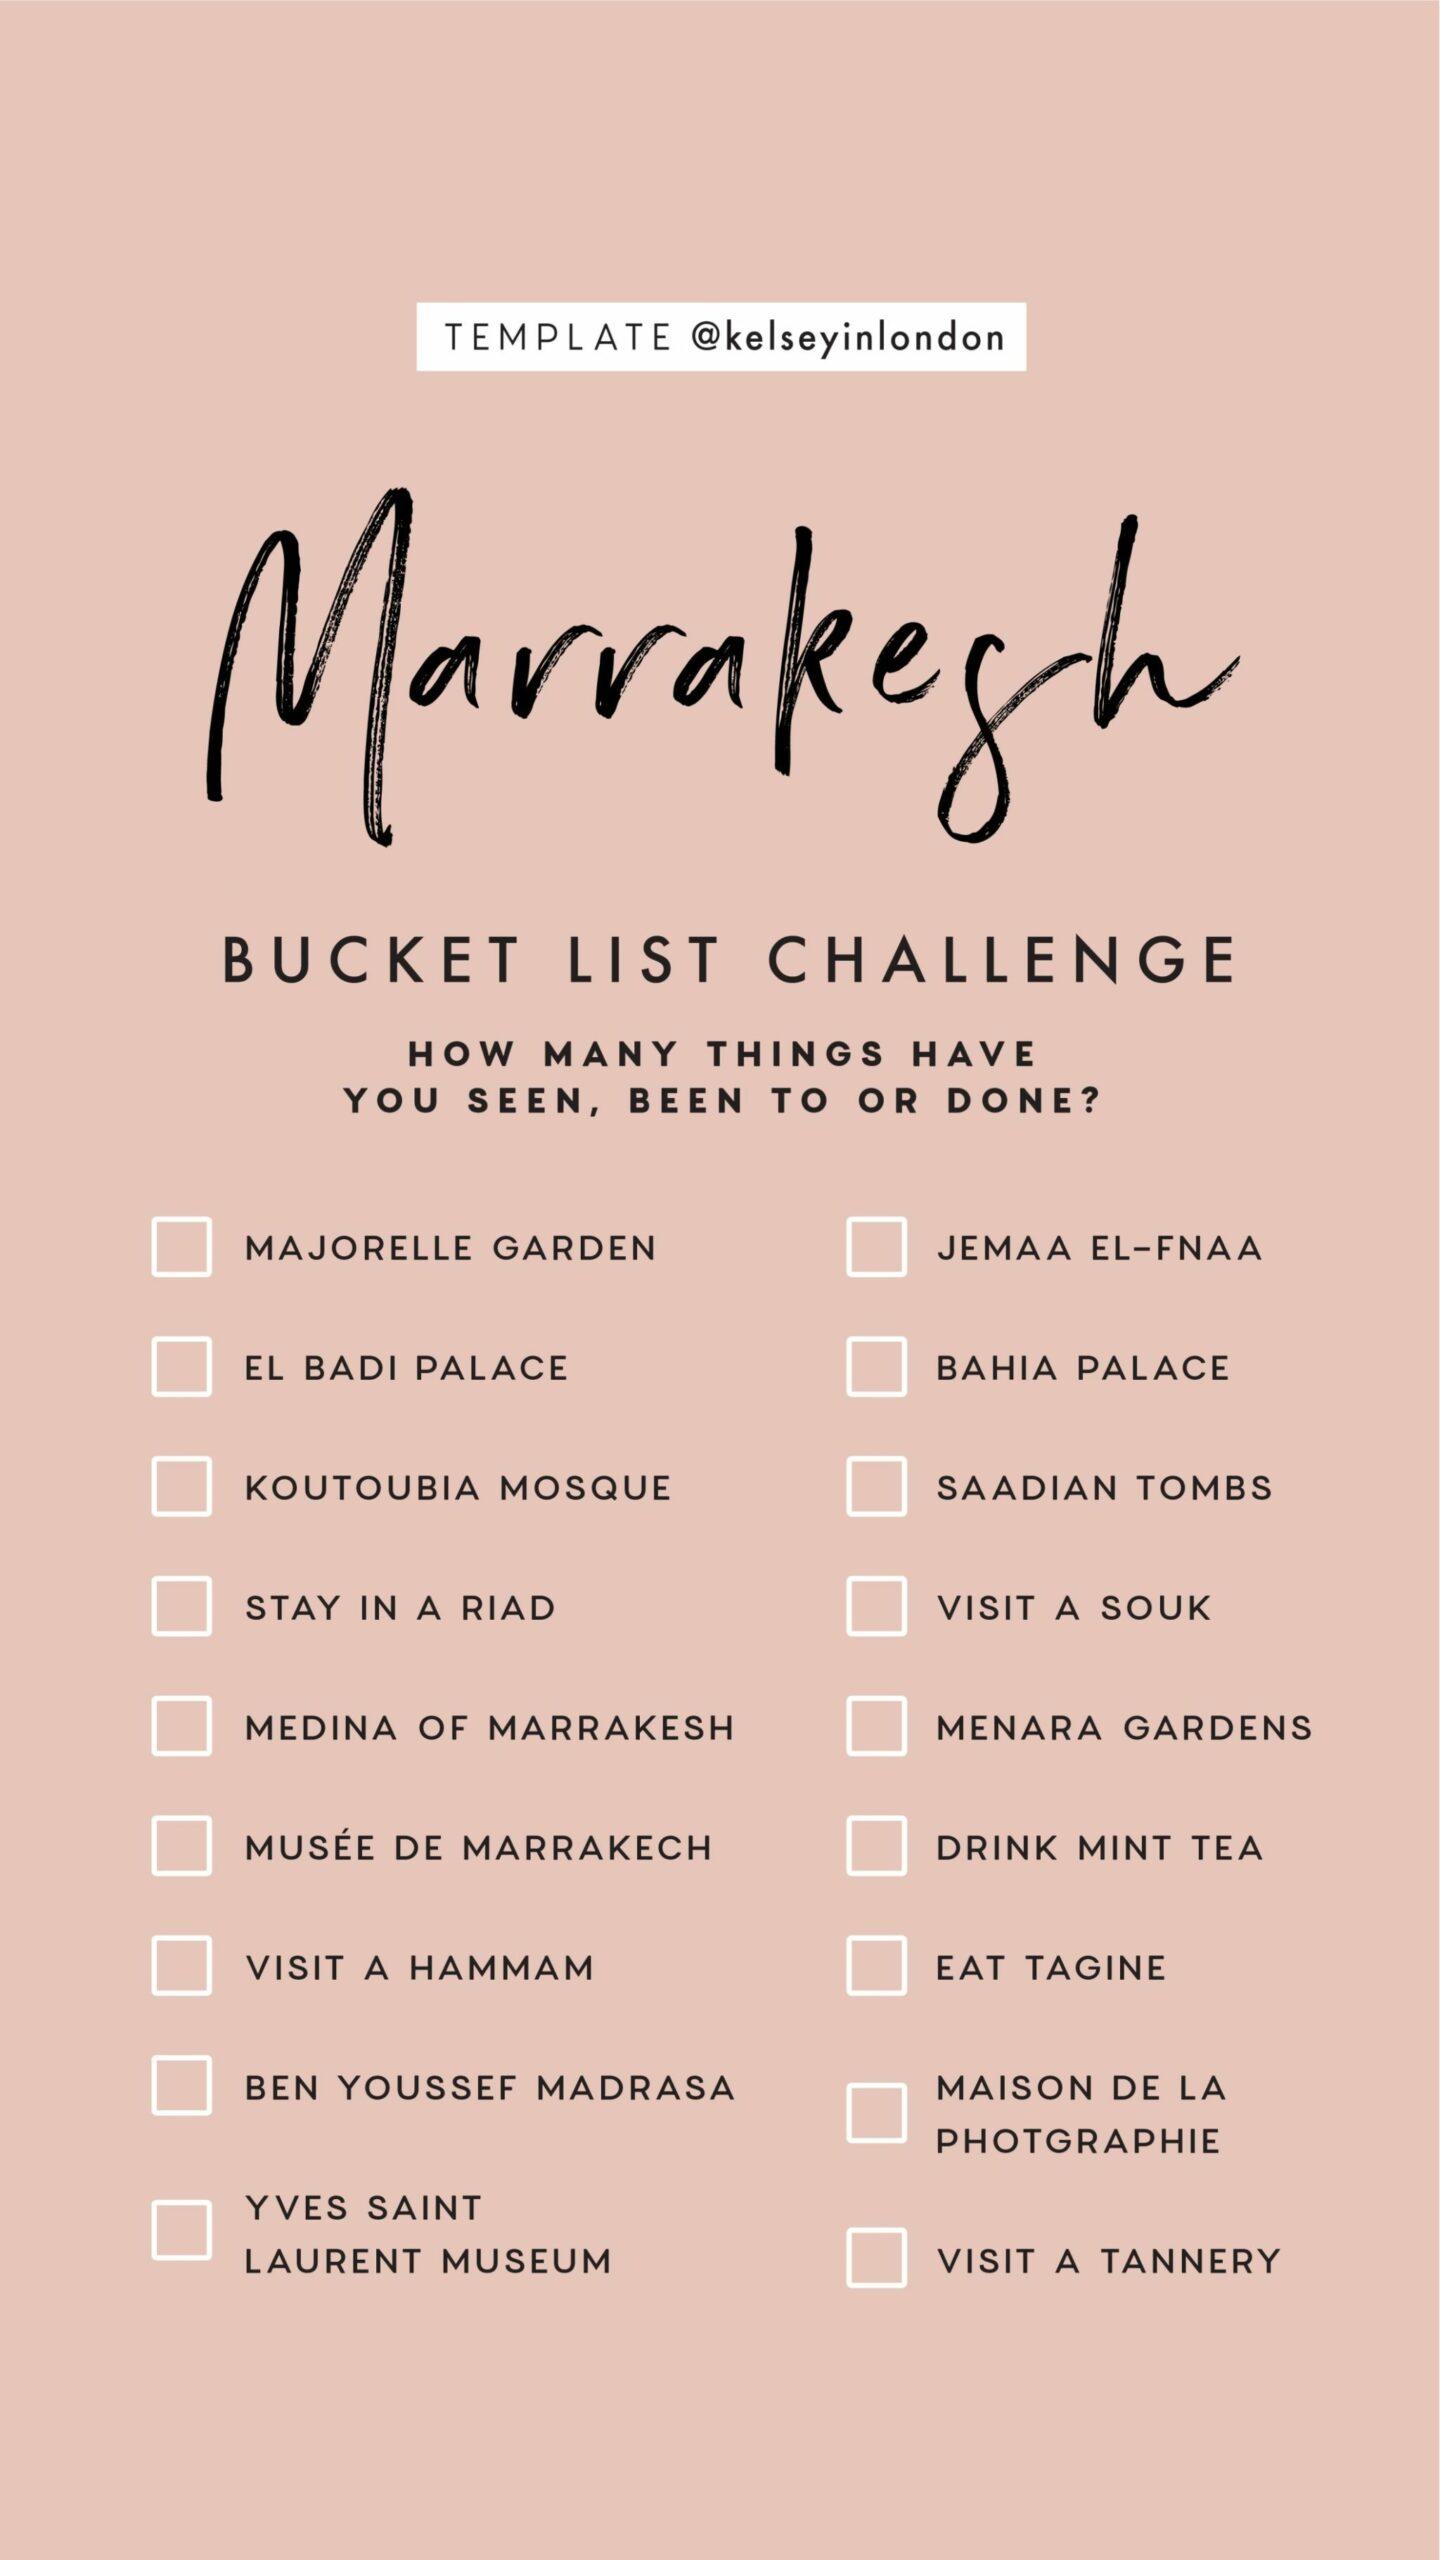 Top things to do in Marrakesh Bucket list Instagram Story Template kelseyinlondon Kelsey Heinrichs What to do in Marrakesh Where to go in Marrakesh top places in Marrakesh